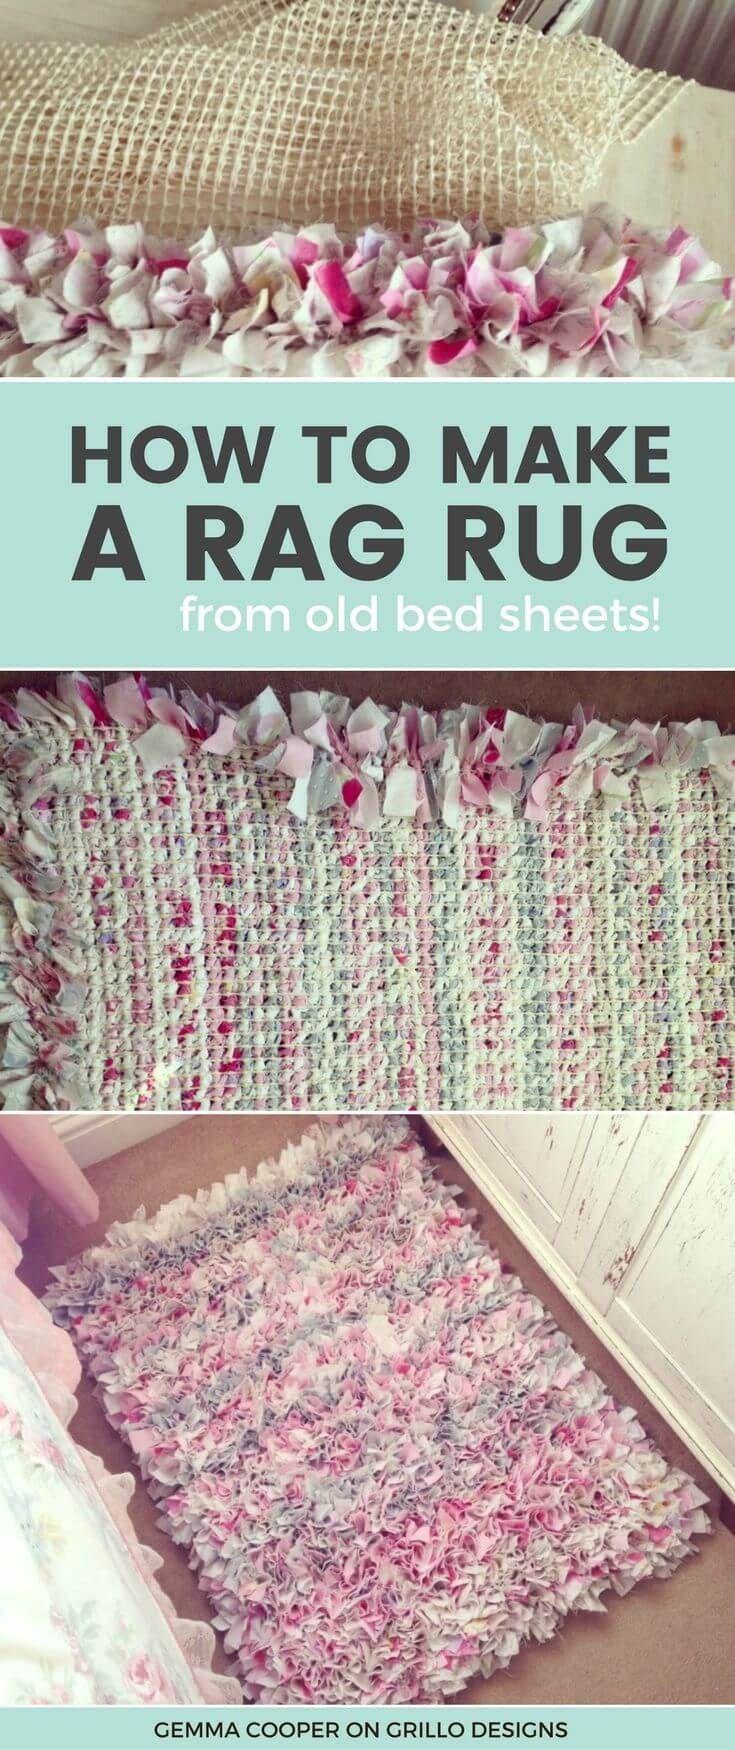 DIY Rug Ideas for Rag Rugs